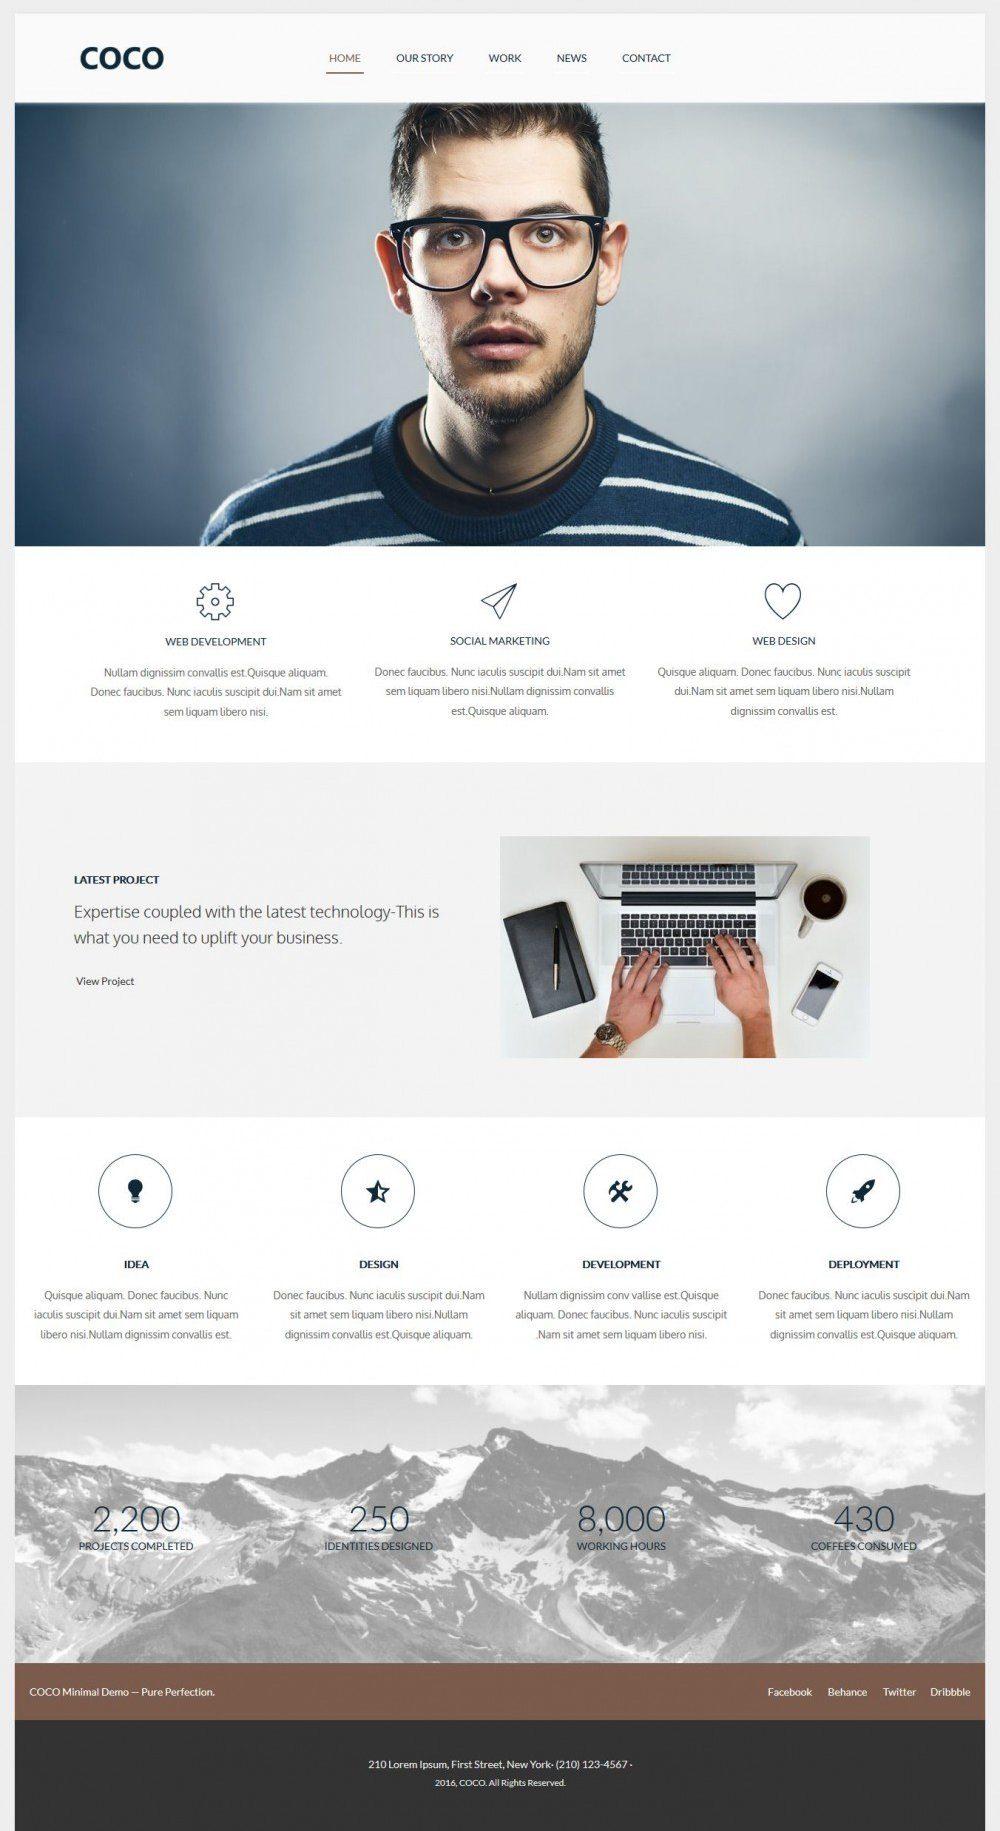 COCO - Flat Designed Wordpress Web Agency Theme